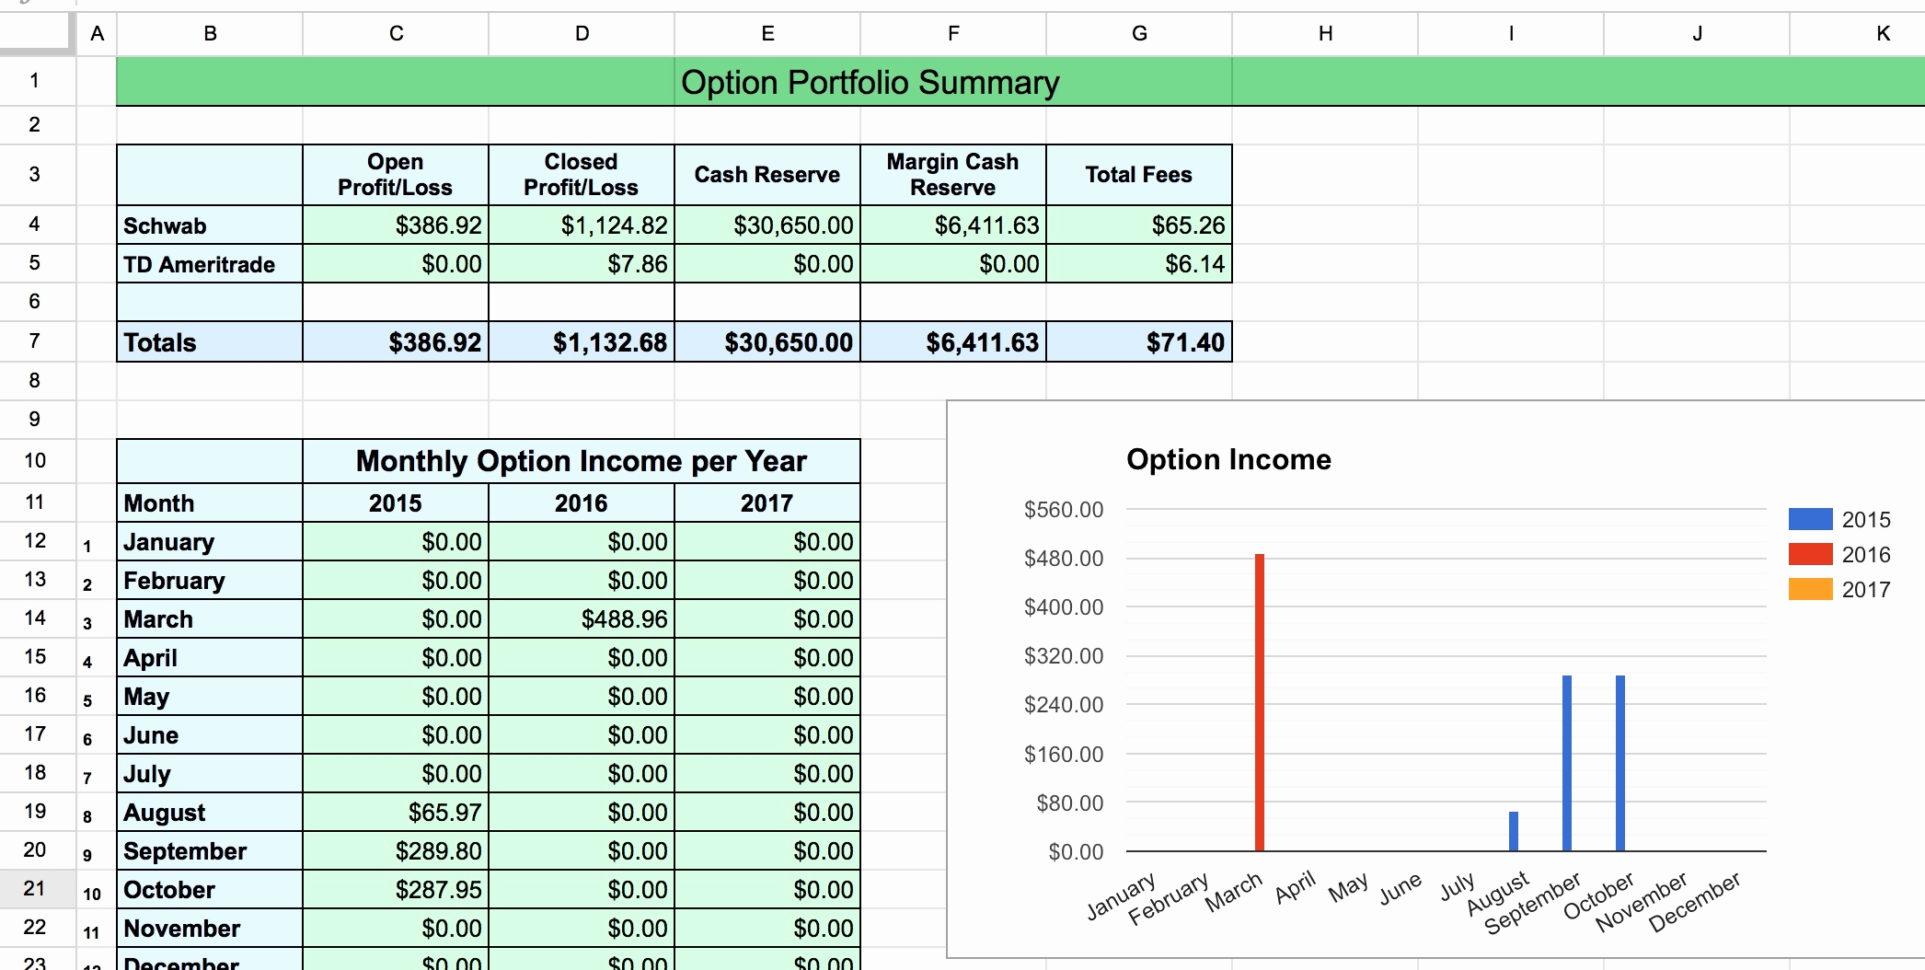 Golf Stats Tracker Excel Beautiful Golf Stats Tracker Excel Awesome With Golf Stat Tracker Spreadsheet